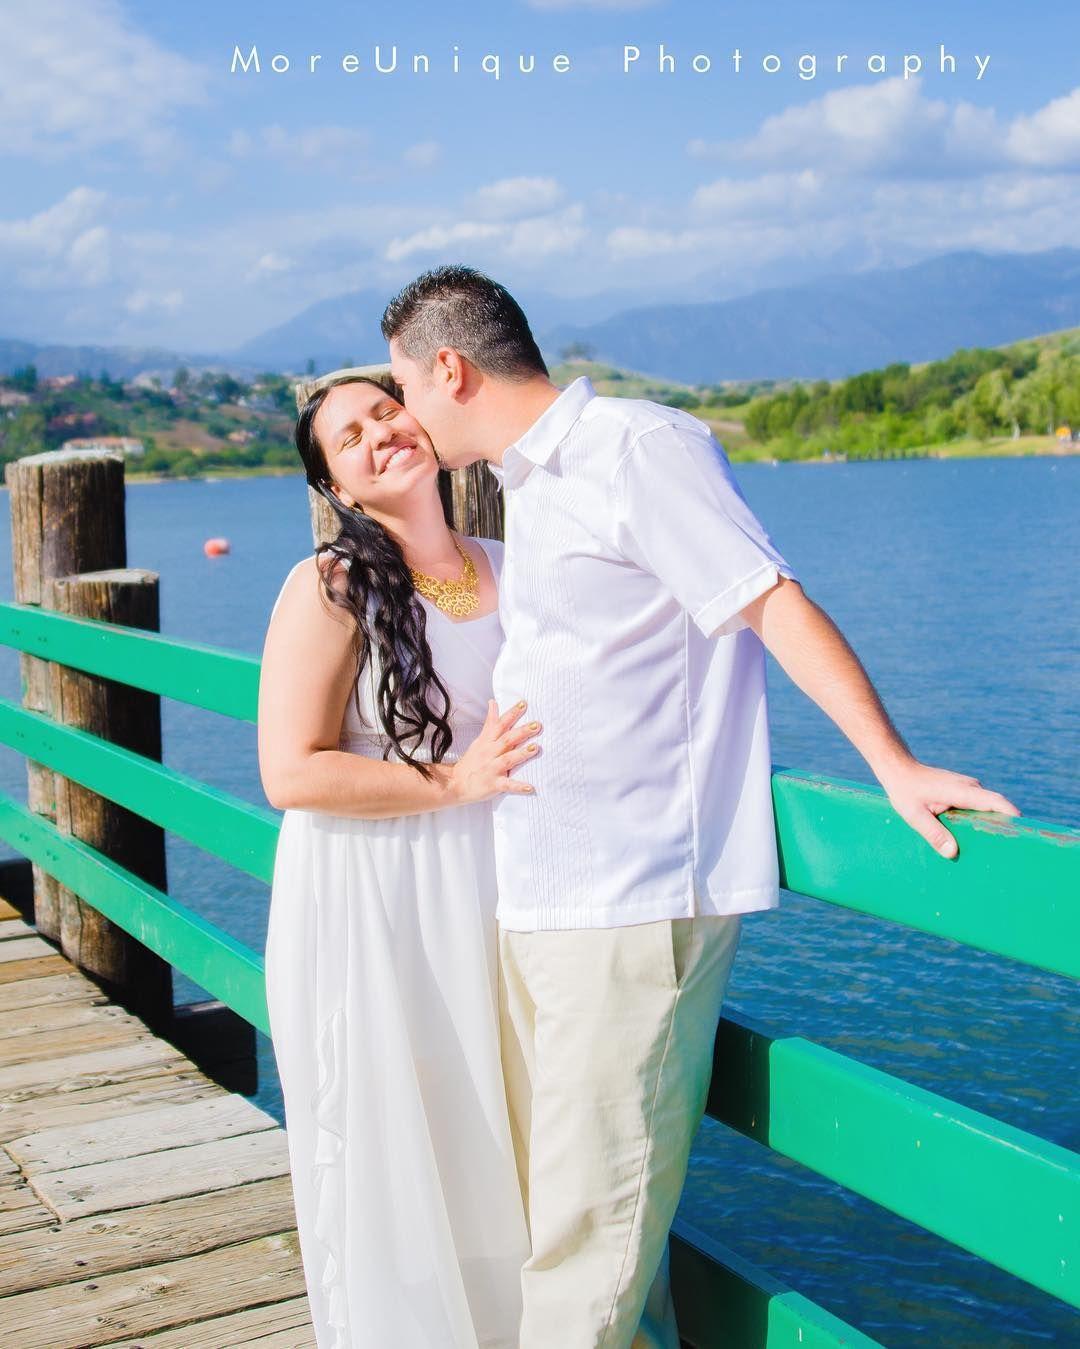 San Dimas dating US Navy online dating